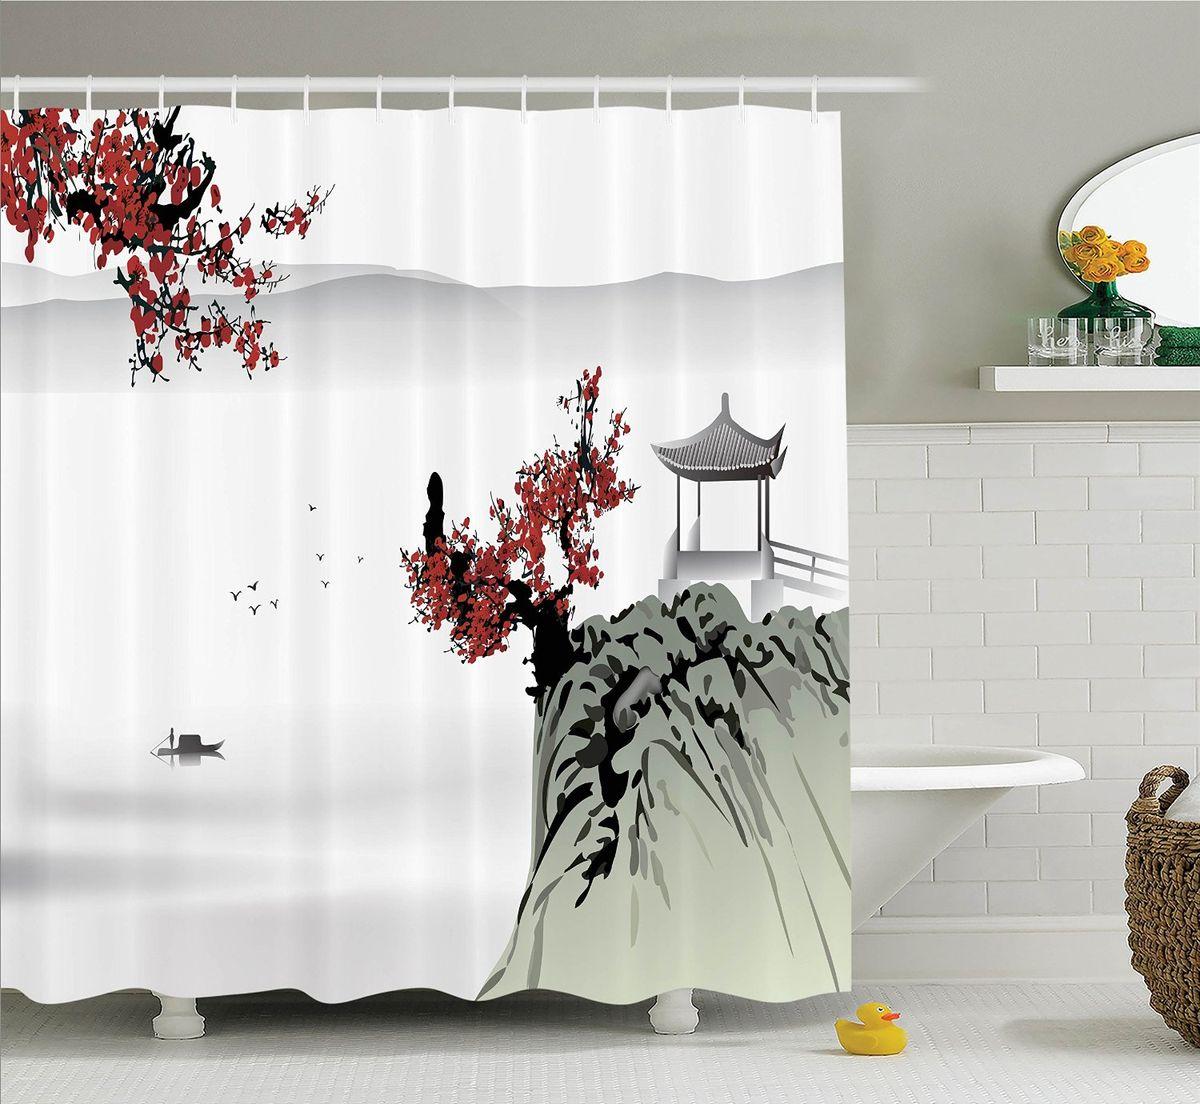 Штора для ванной комнаты Magic Lady Сакура и беседка на горе, 180 х 200 см штора для ванной комнаты magic lady сакура на фоне гор 180 х 200 см